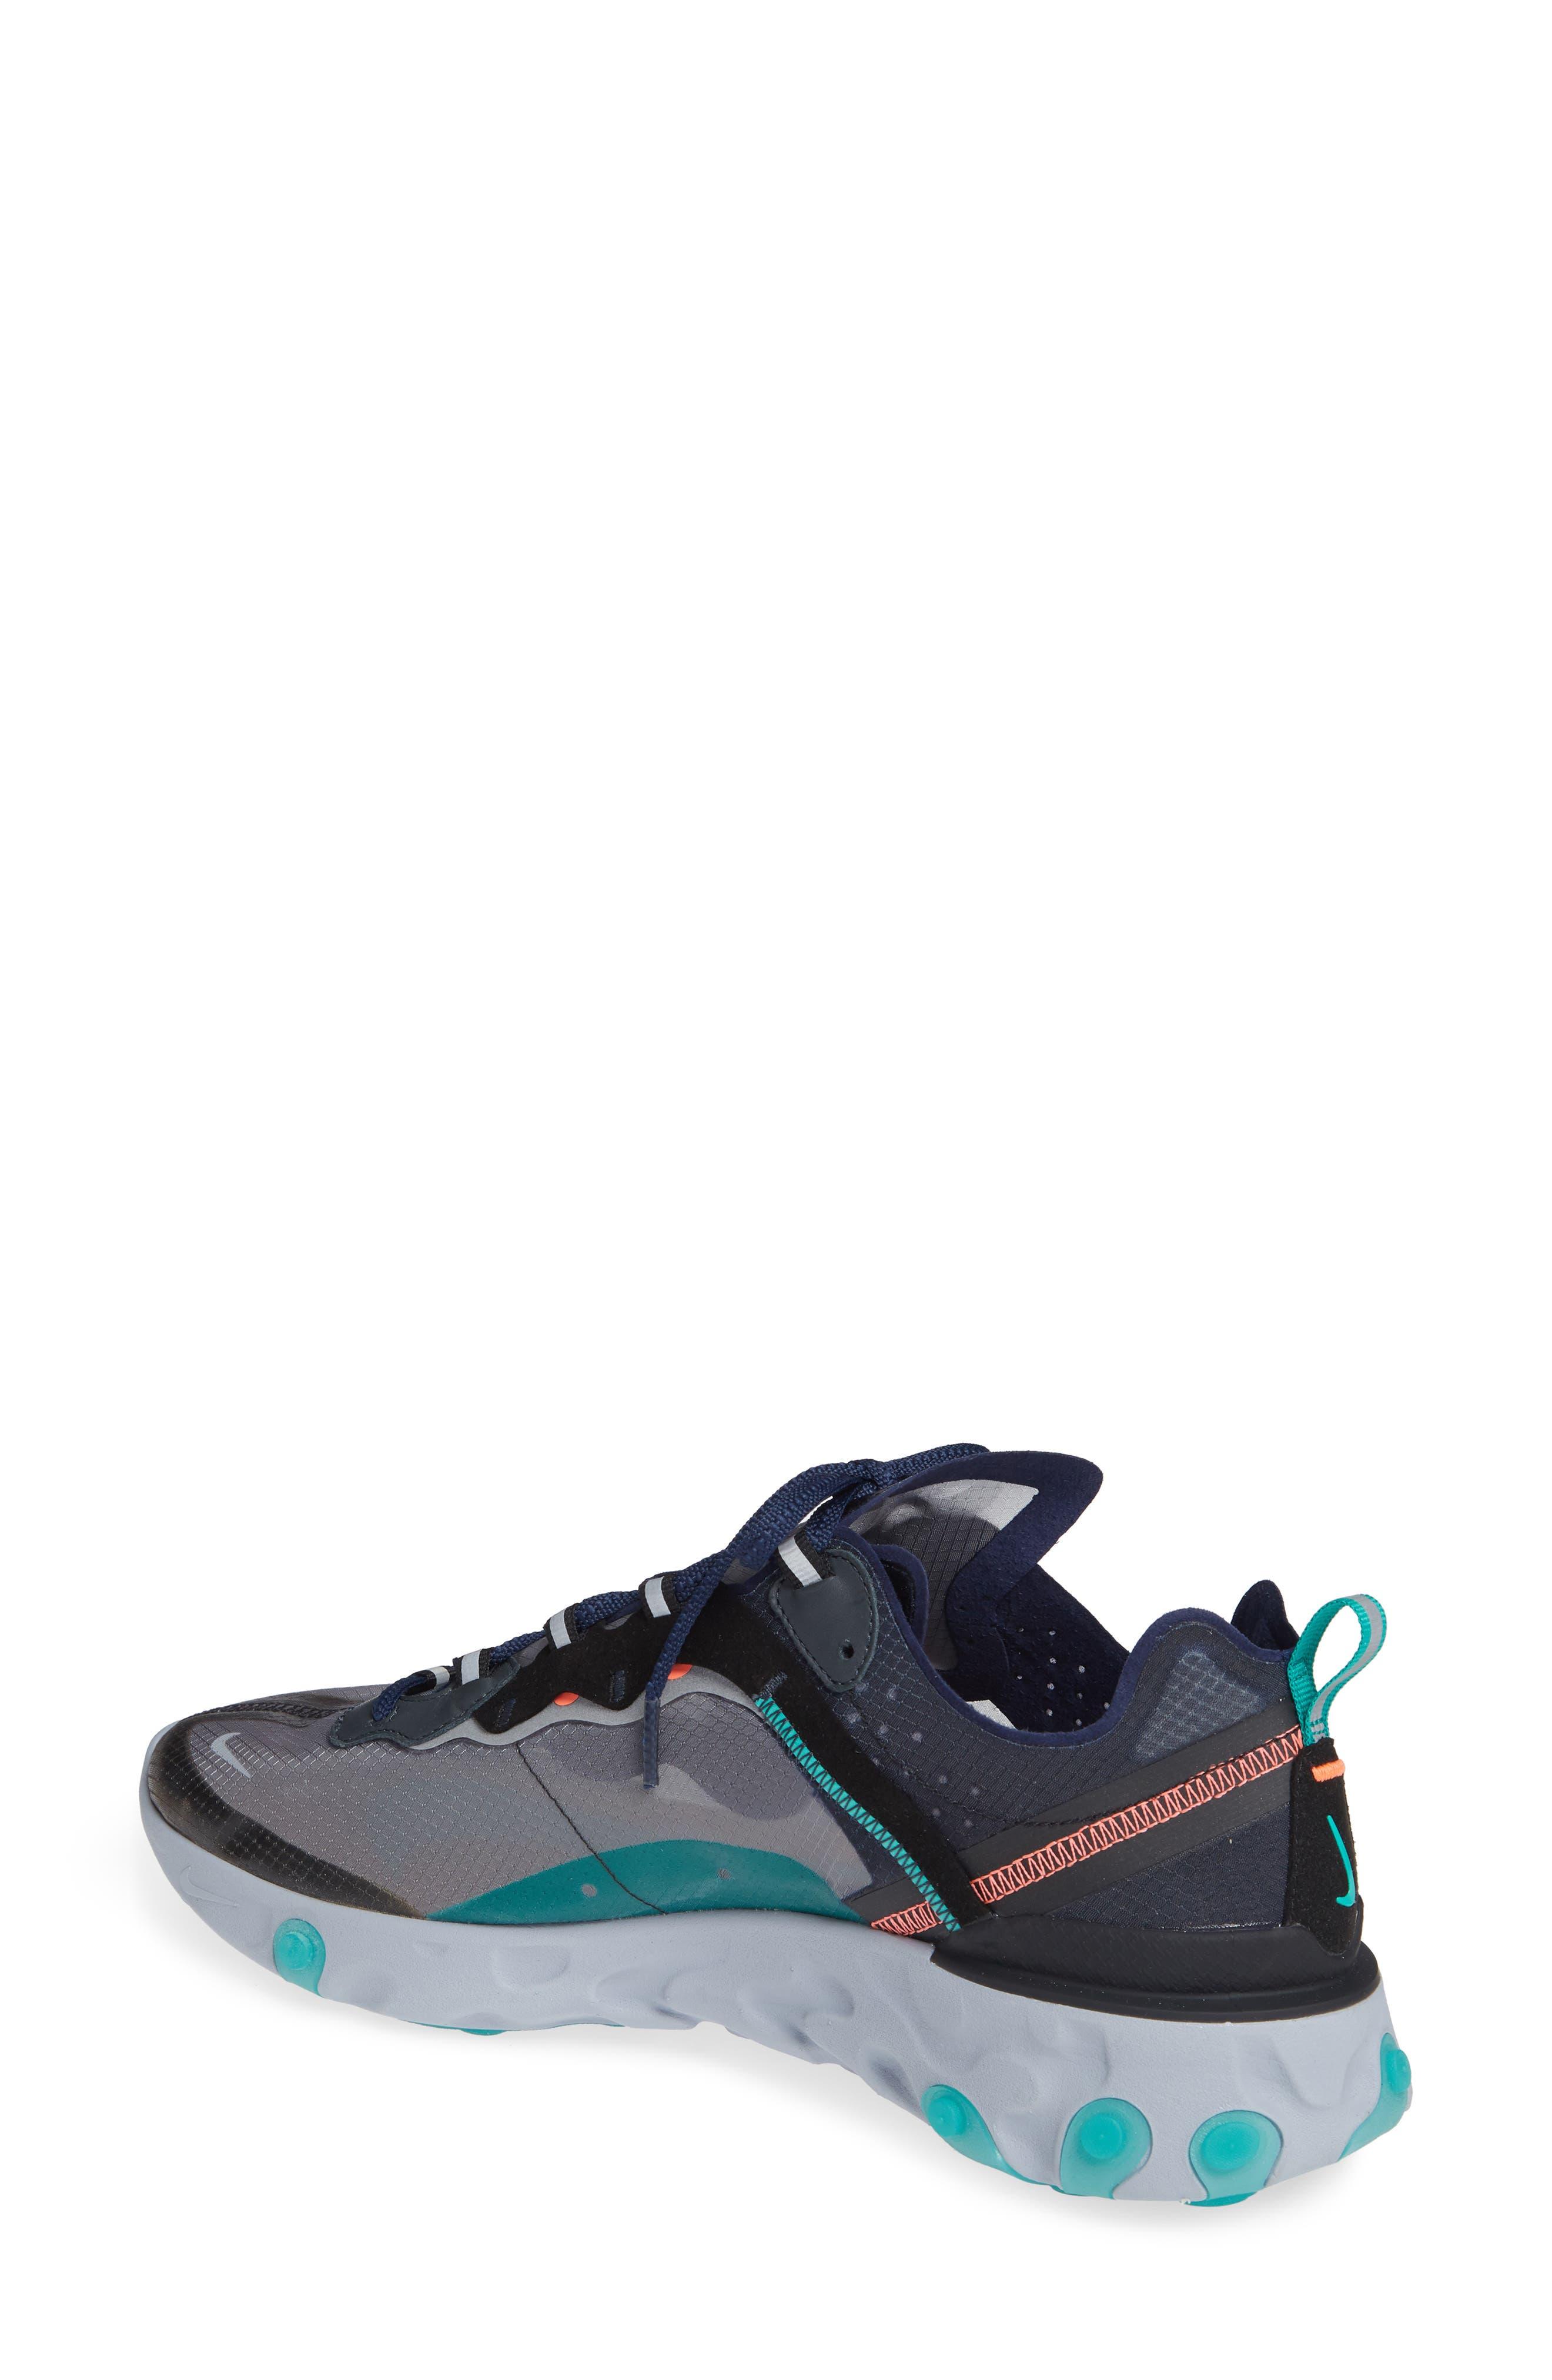 React Element 87 Sneaker,                             Alternate thumbnail 2, color,                             BLACK/ MIDNIGHT NAVY/ GREEN